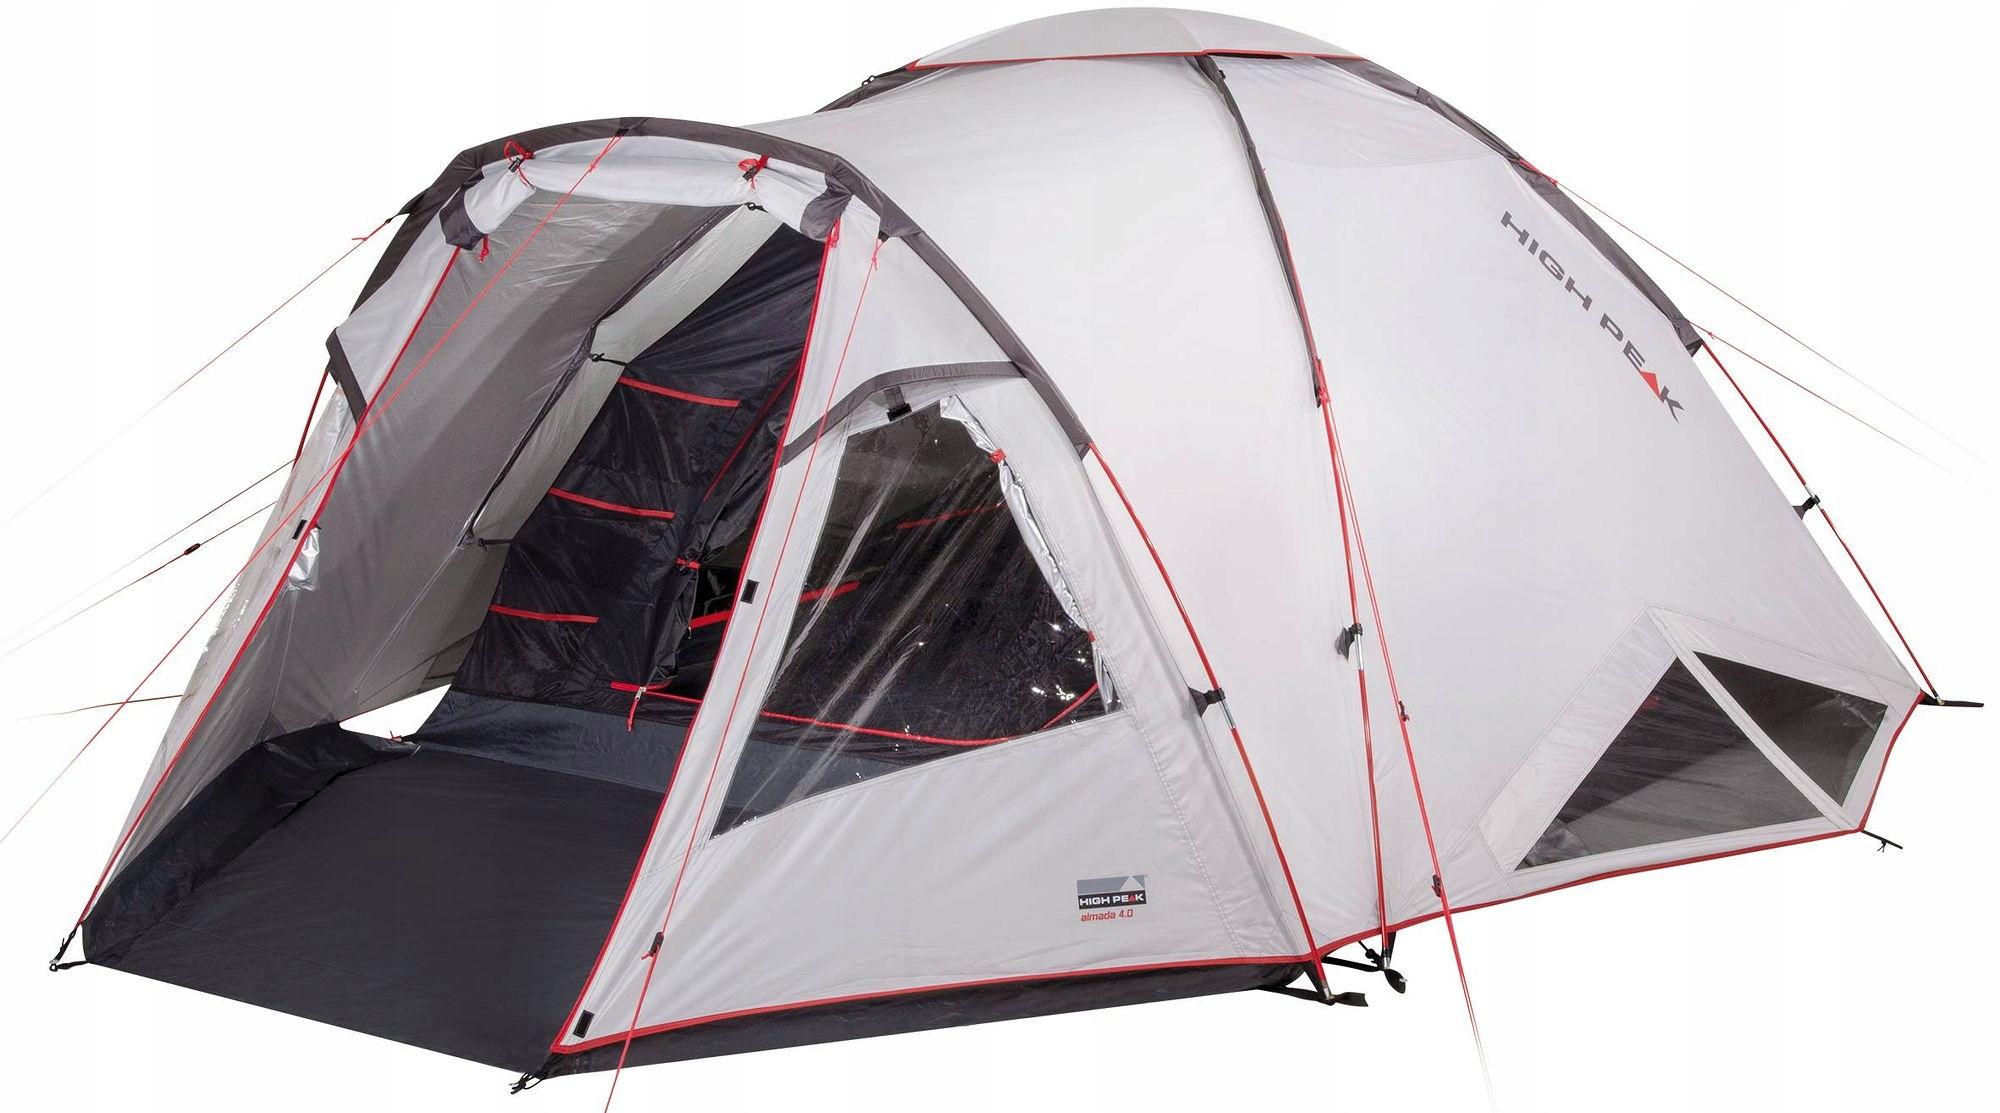 Namiot Turystyczny 4 Osobowy Almada 4 High Peak 9501690550 Allegro Pl